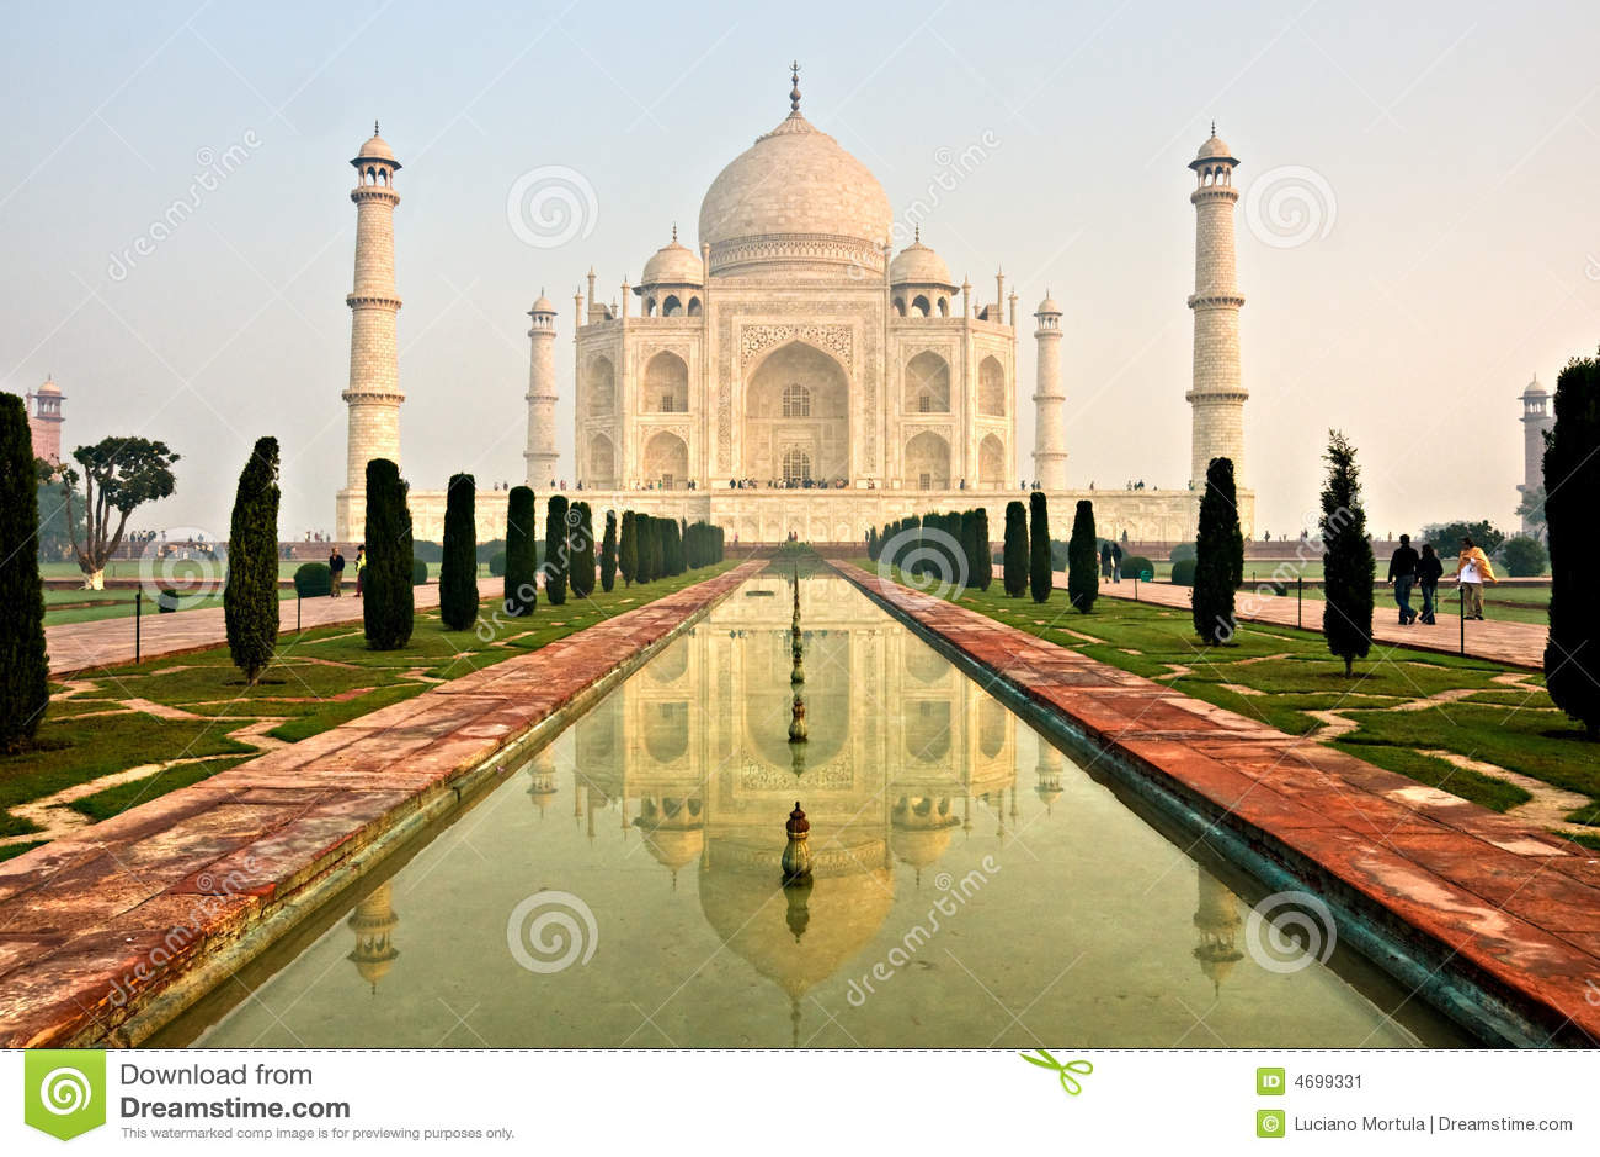 Taj mahal, Agra, India. stock image. Image of palace, mausoleum ...